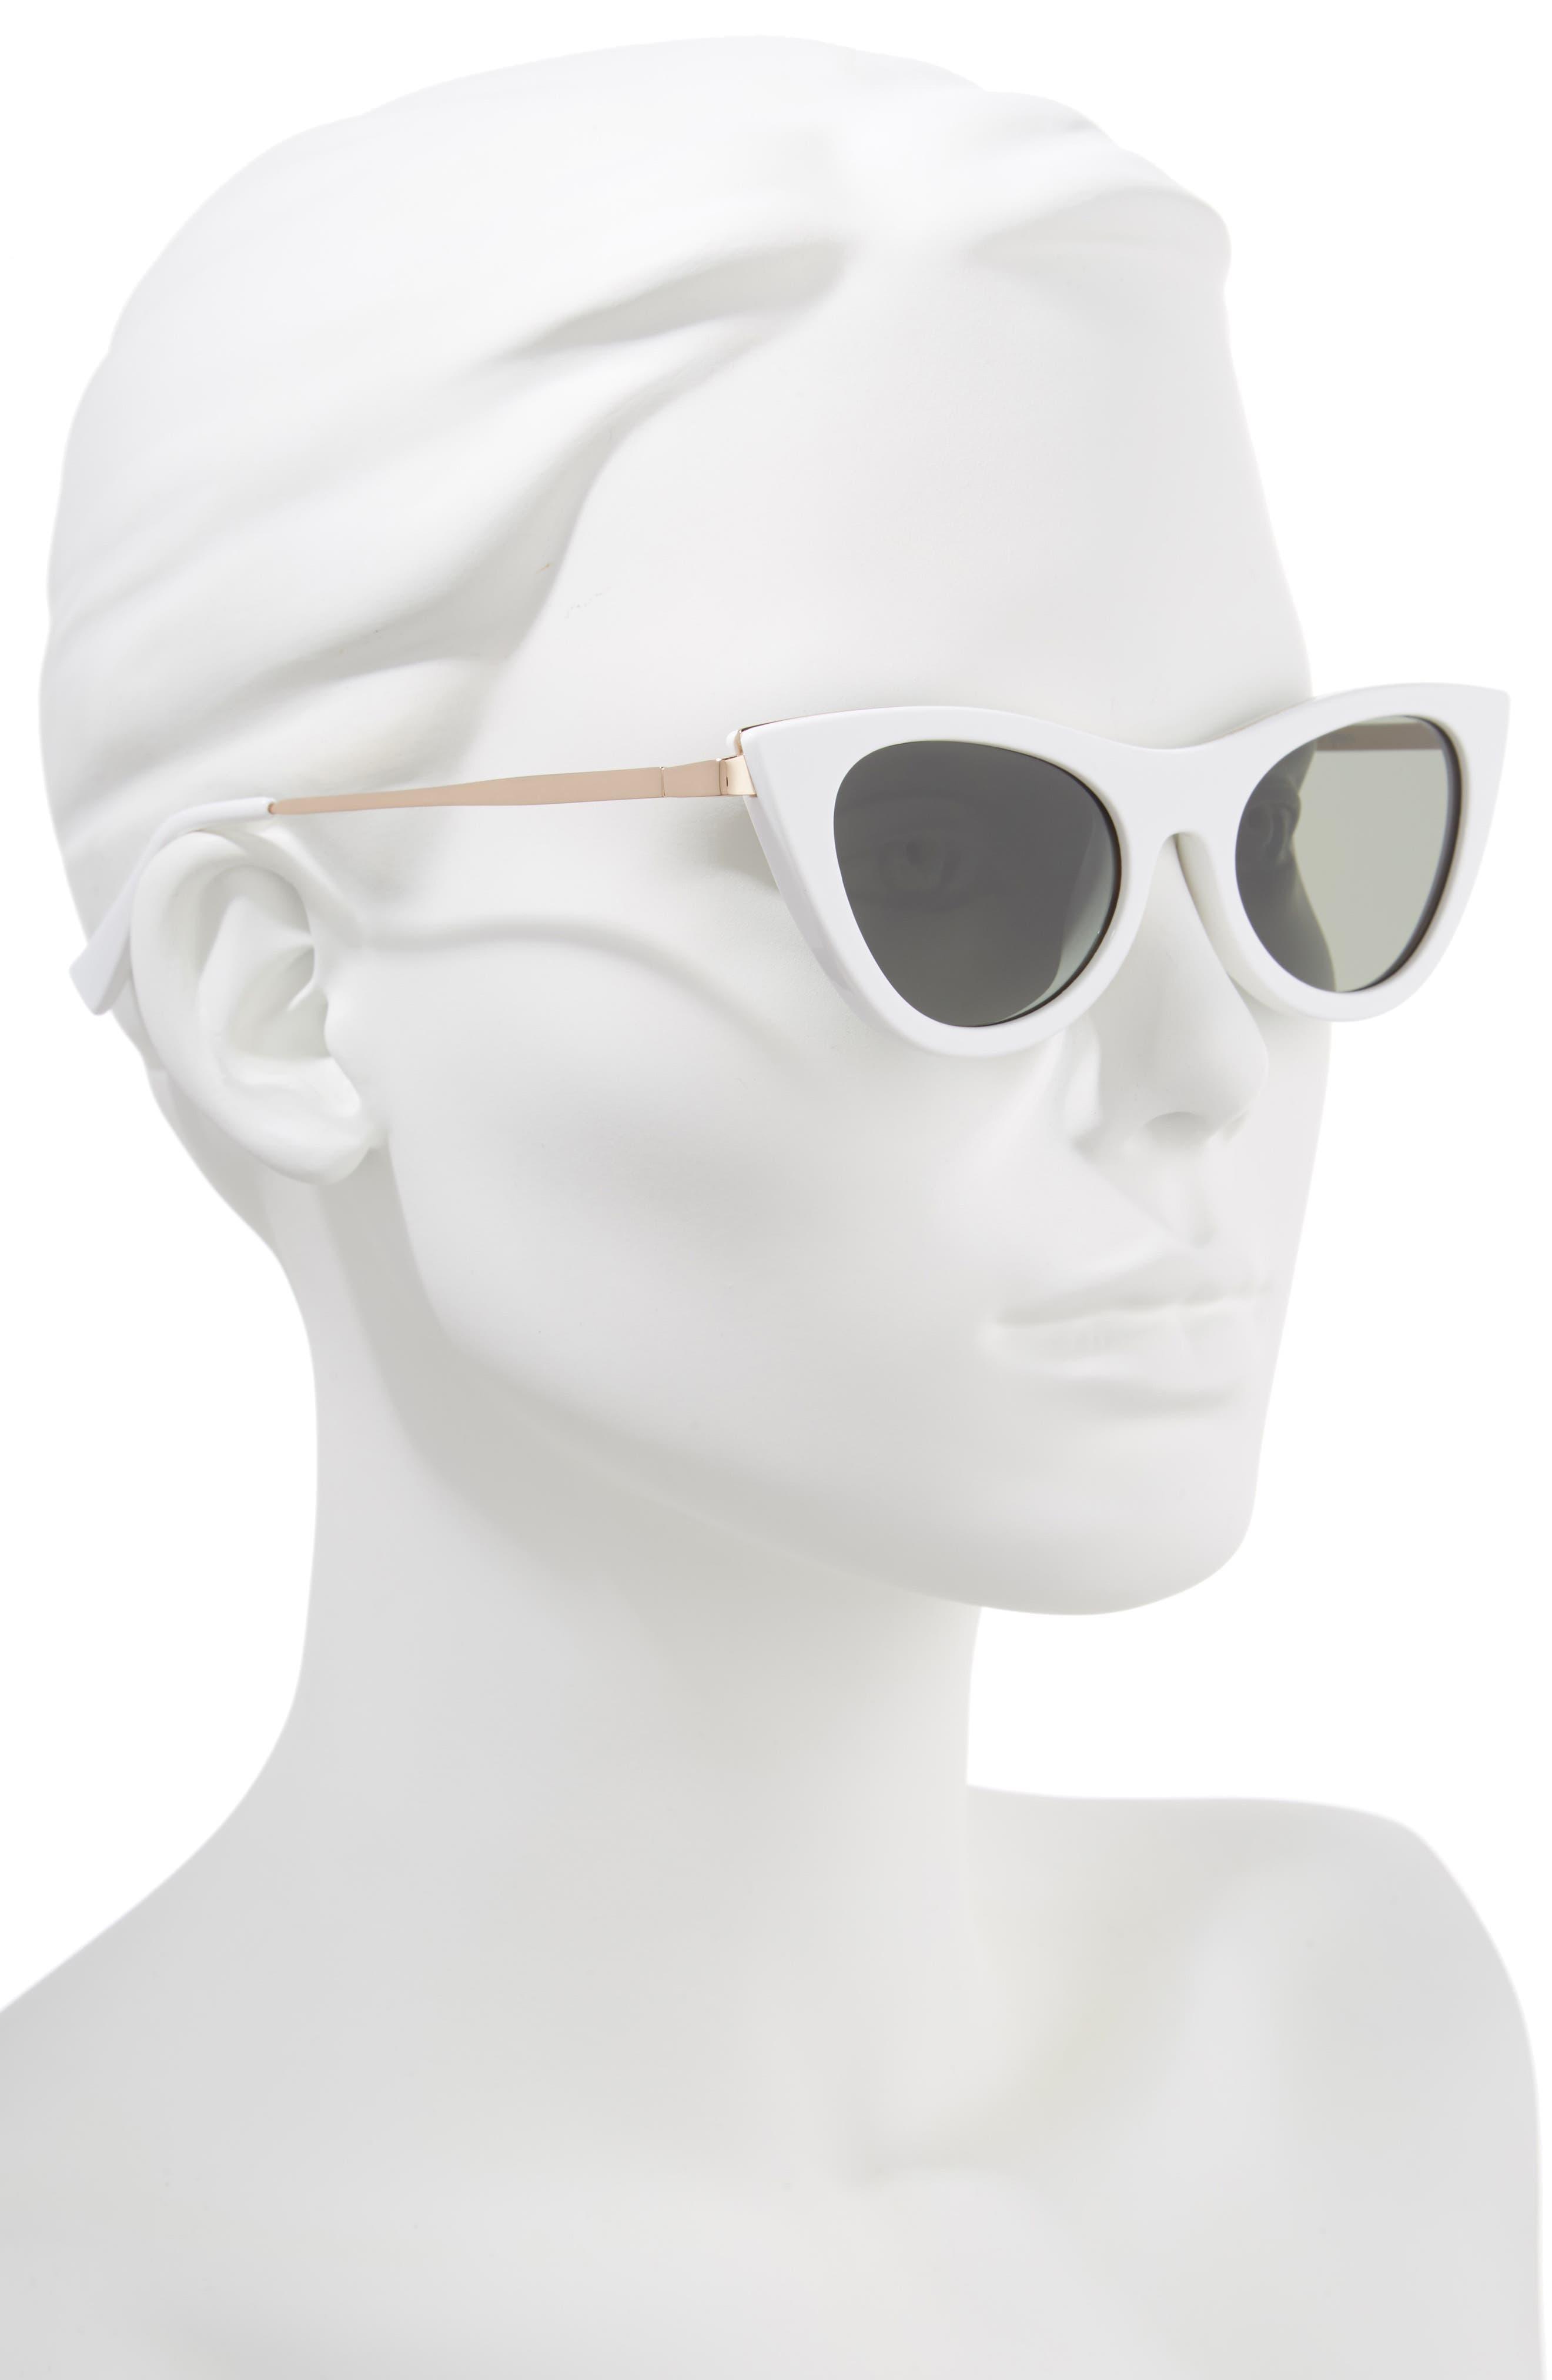 Enchantress 50mm Cat Eye Sunglasses,                             Alternate thumbnail 2, color,                             WHITE